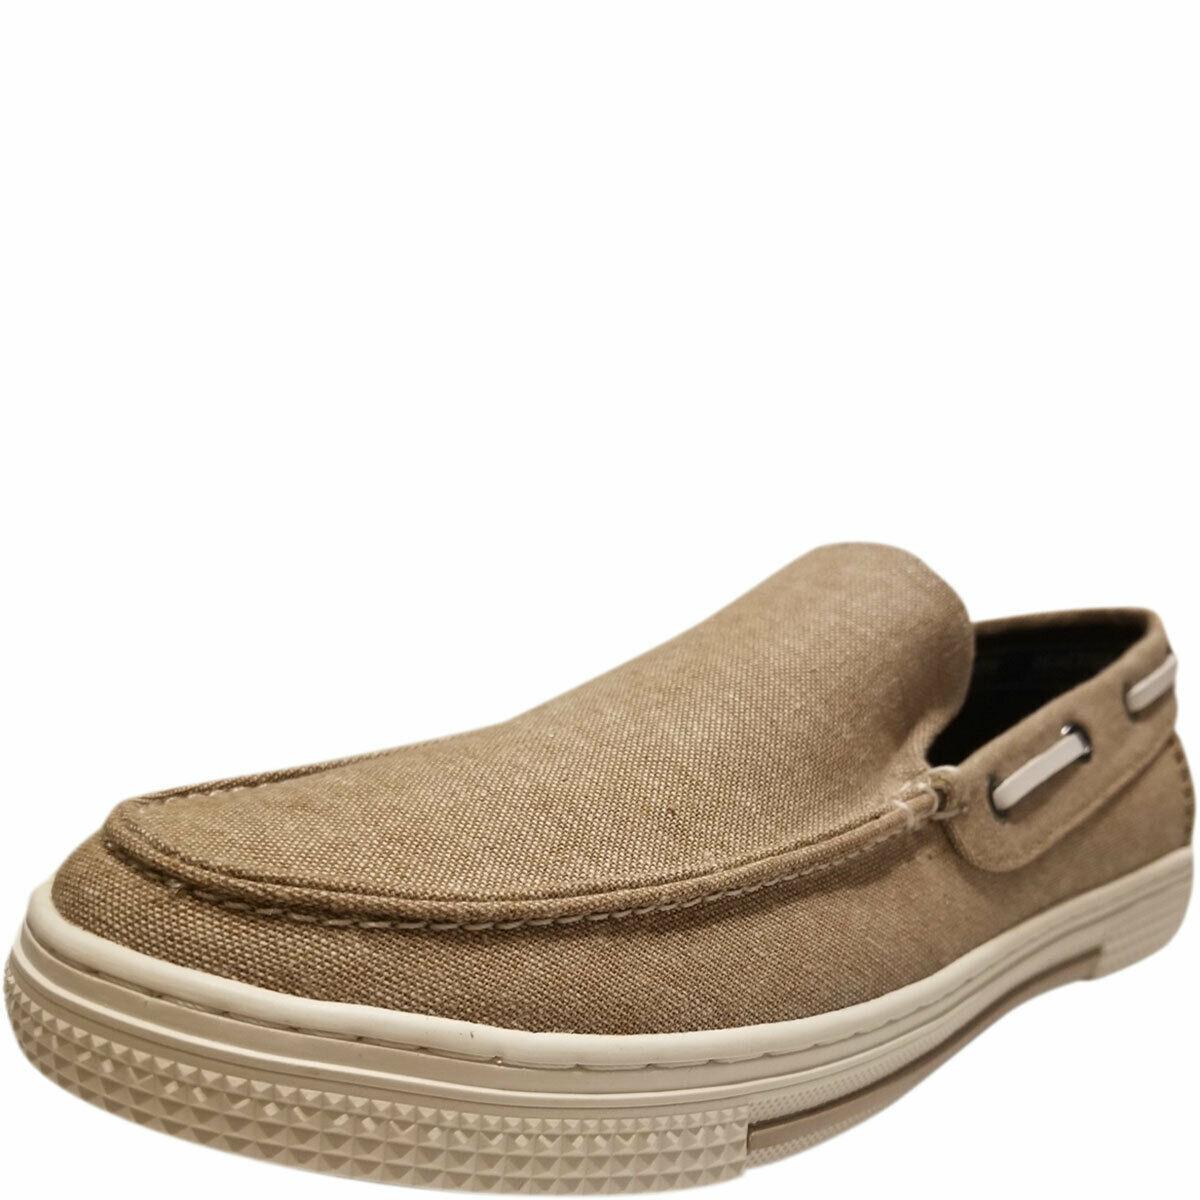 Kenneth Cole Reaction Men's Ankir Canvas Slip-on Boat Shoes Beige Sand 9.5 M ...